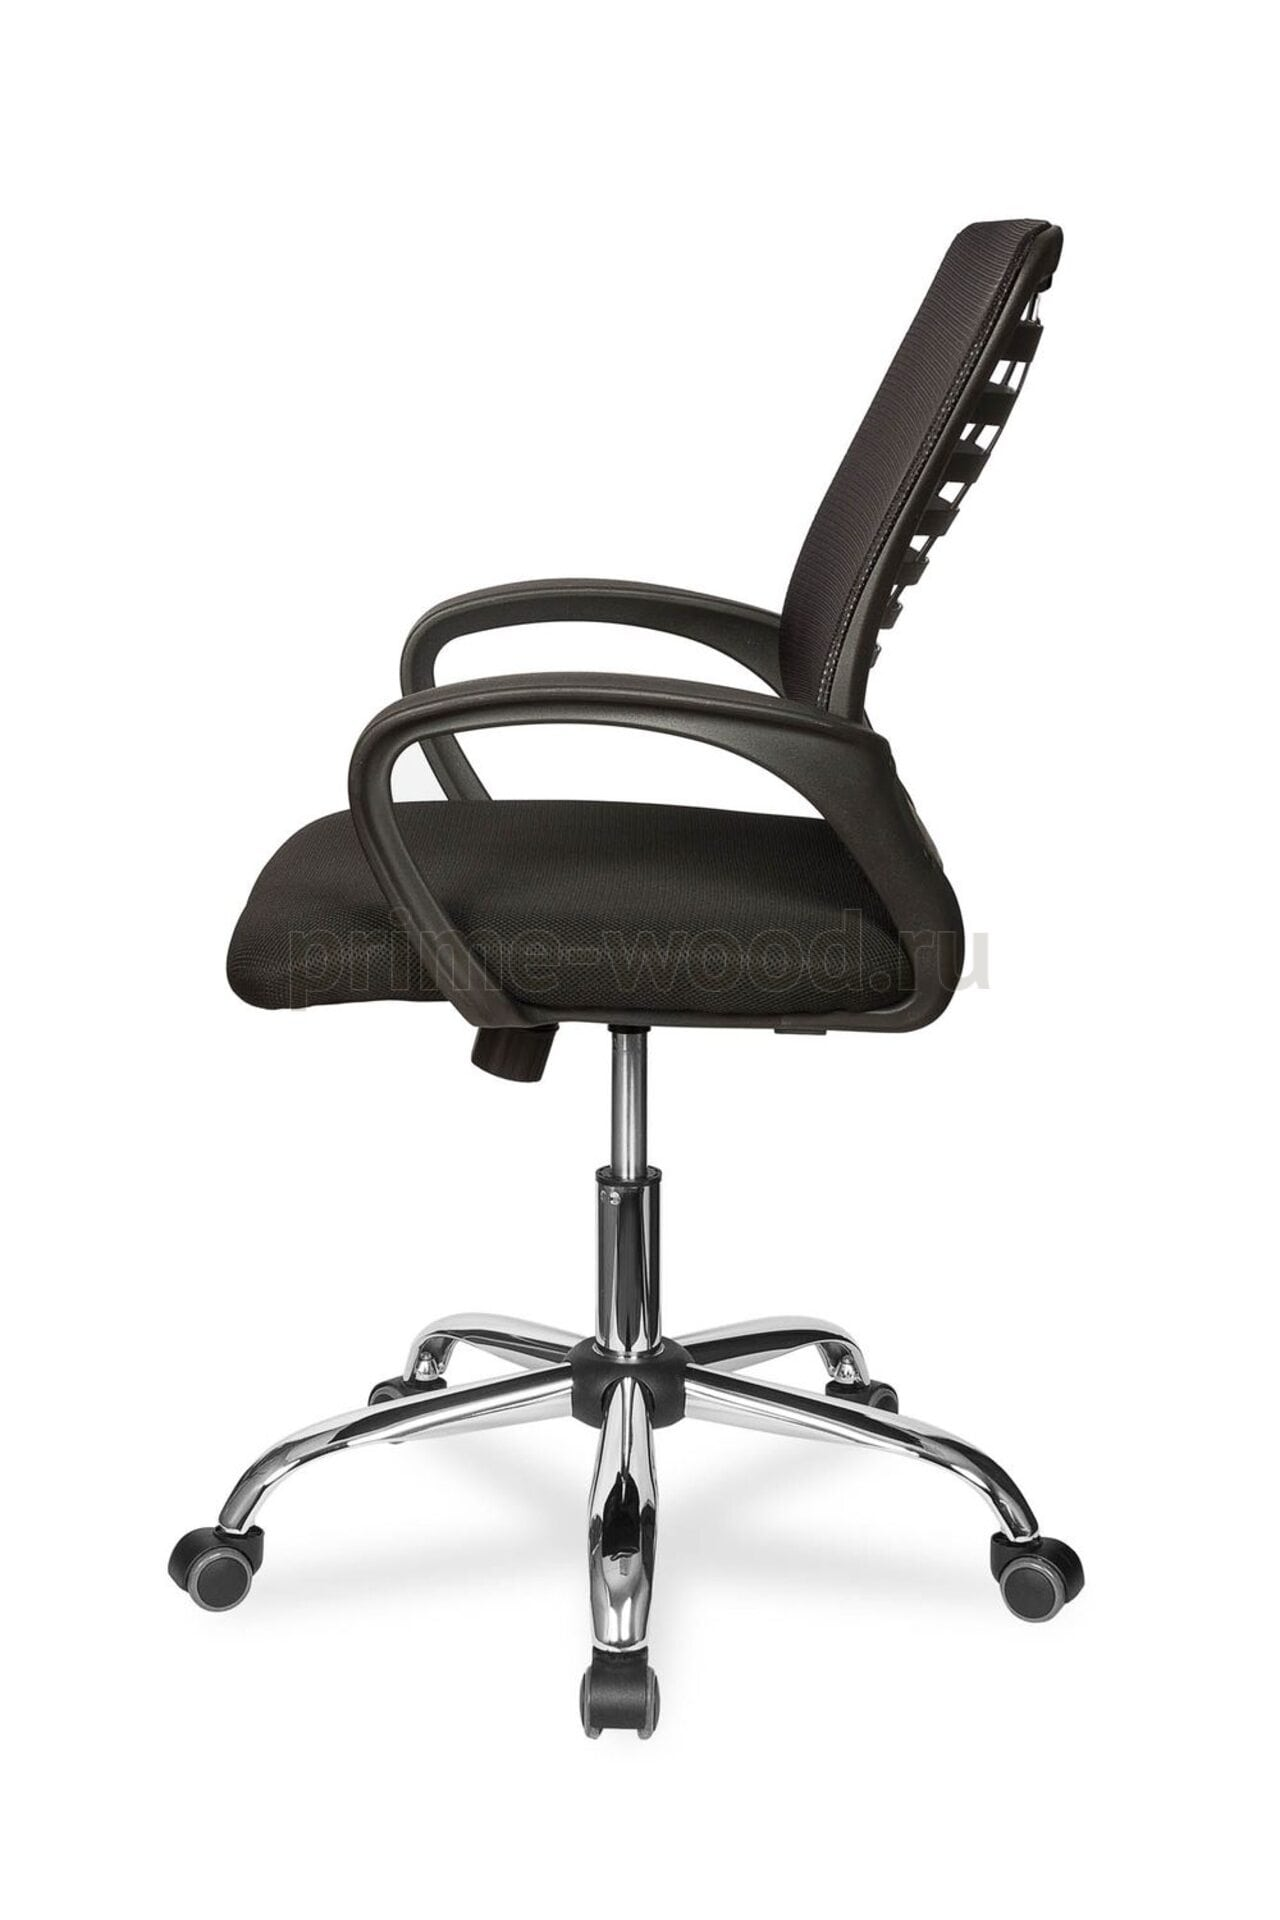 Кресло руководителя College CLG-422 MXH-B - фото 5